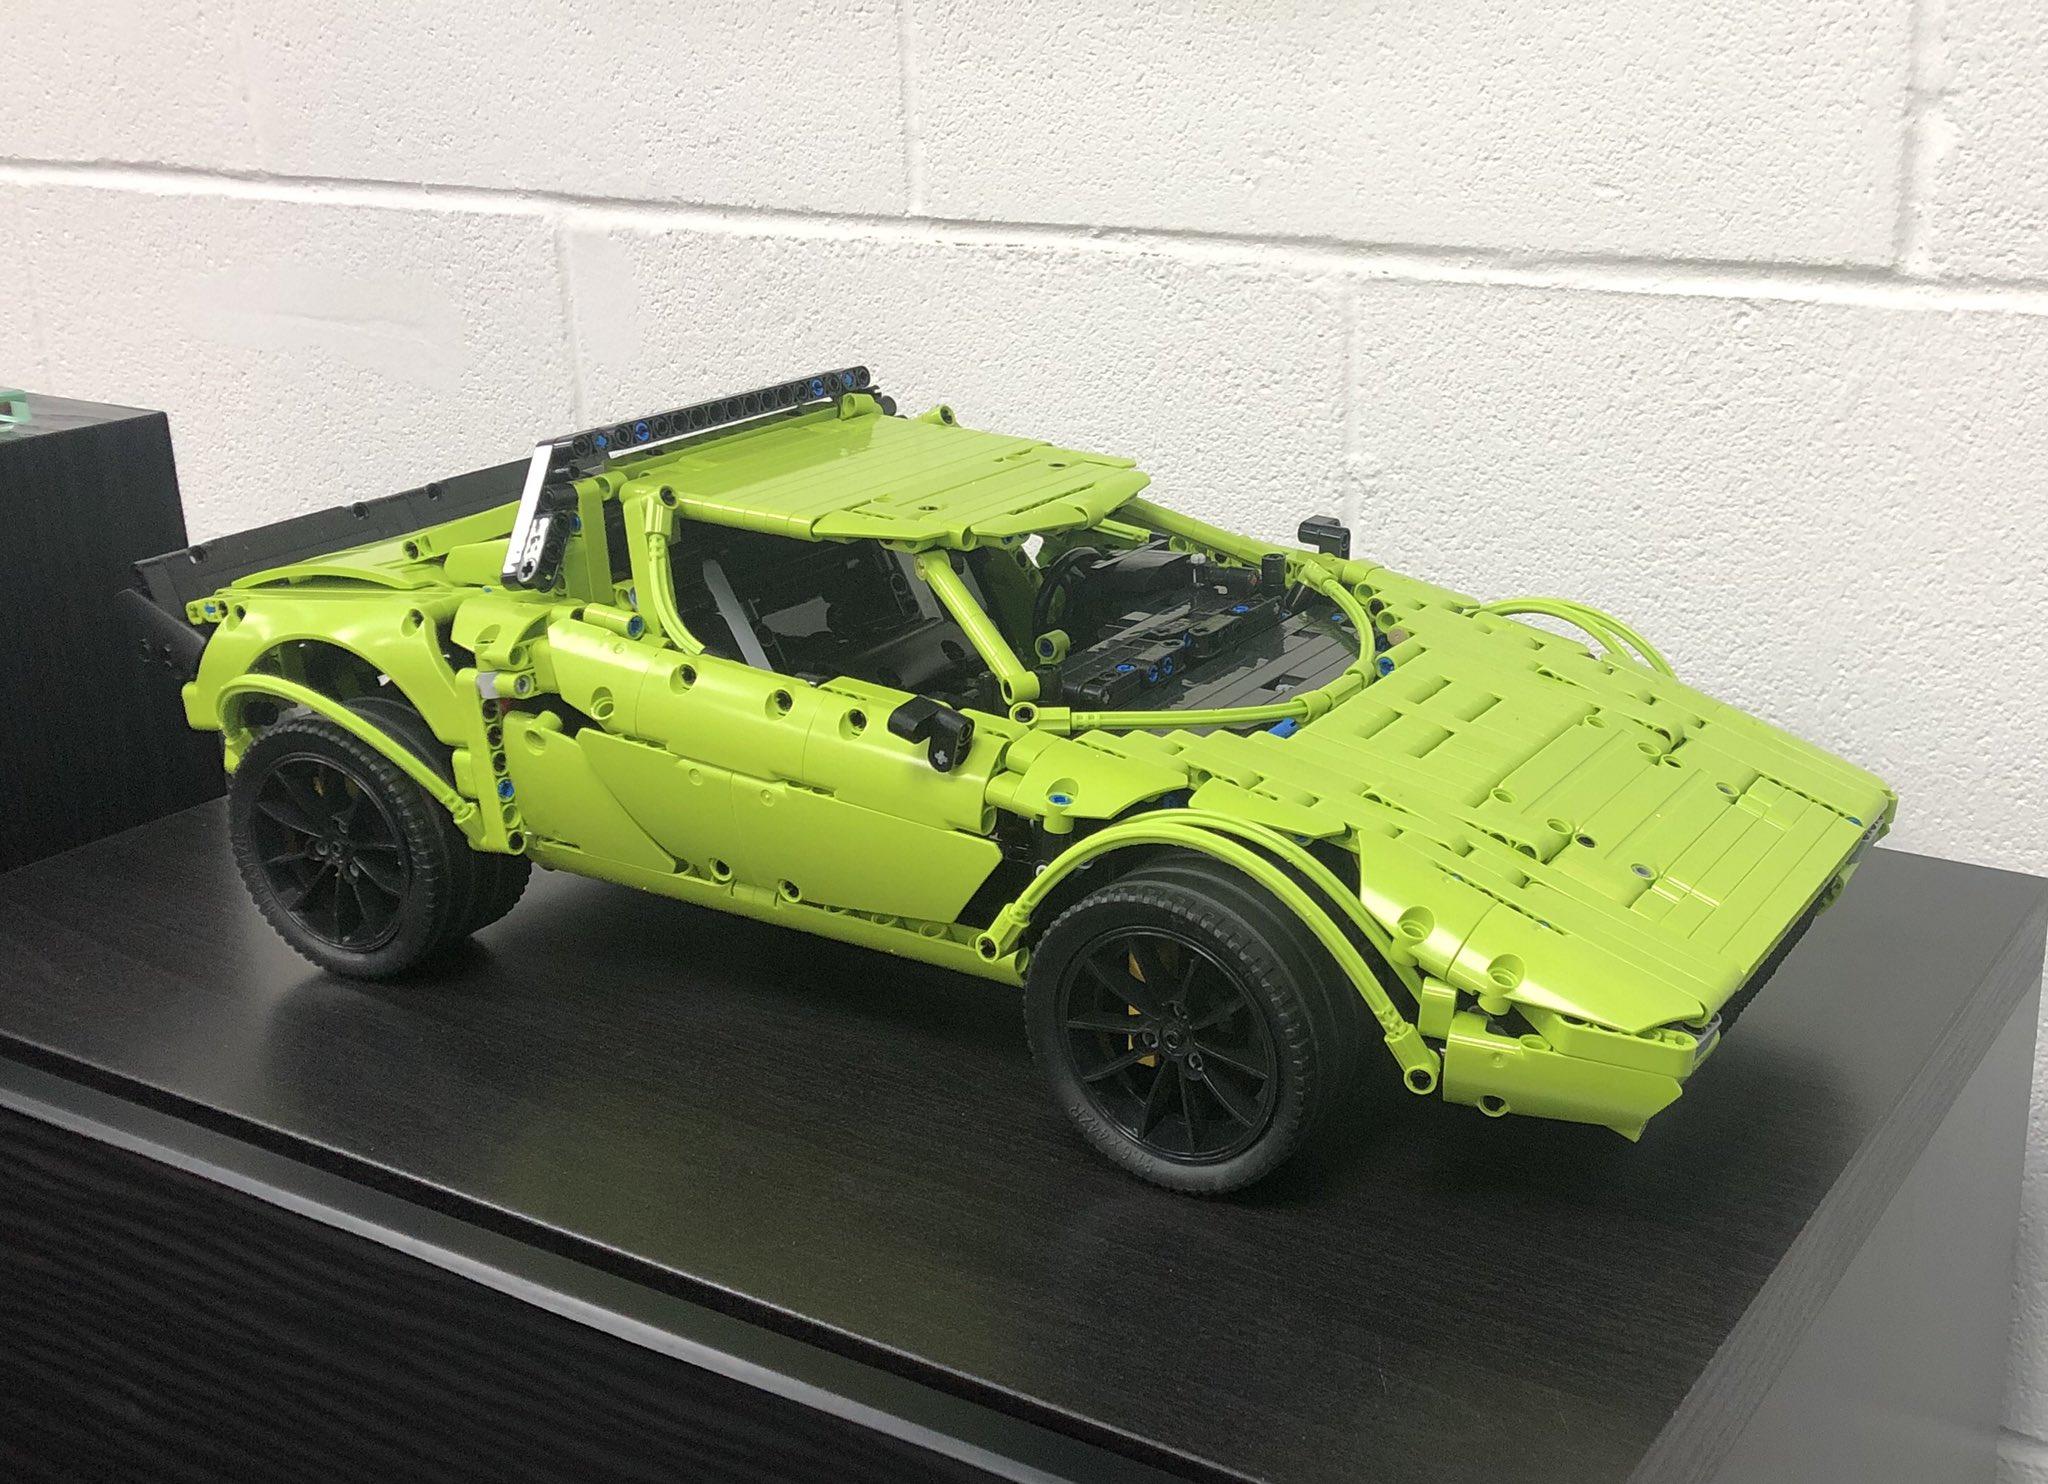 Lego Technic Lancia Stratos Porsche GT3 RS kit (1)